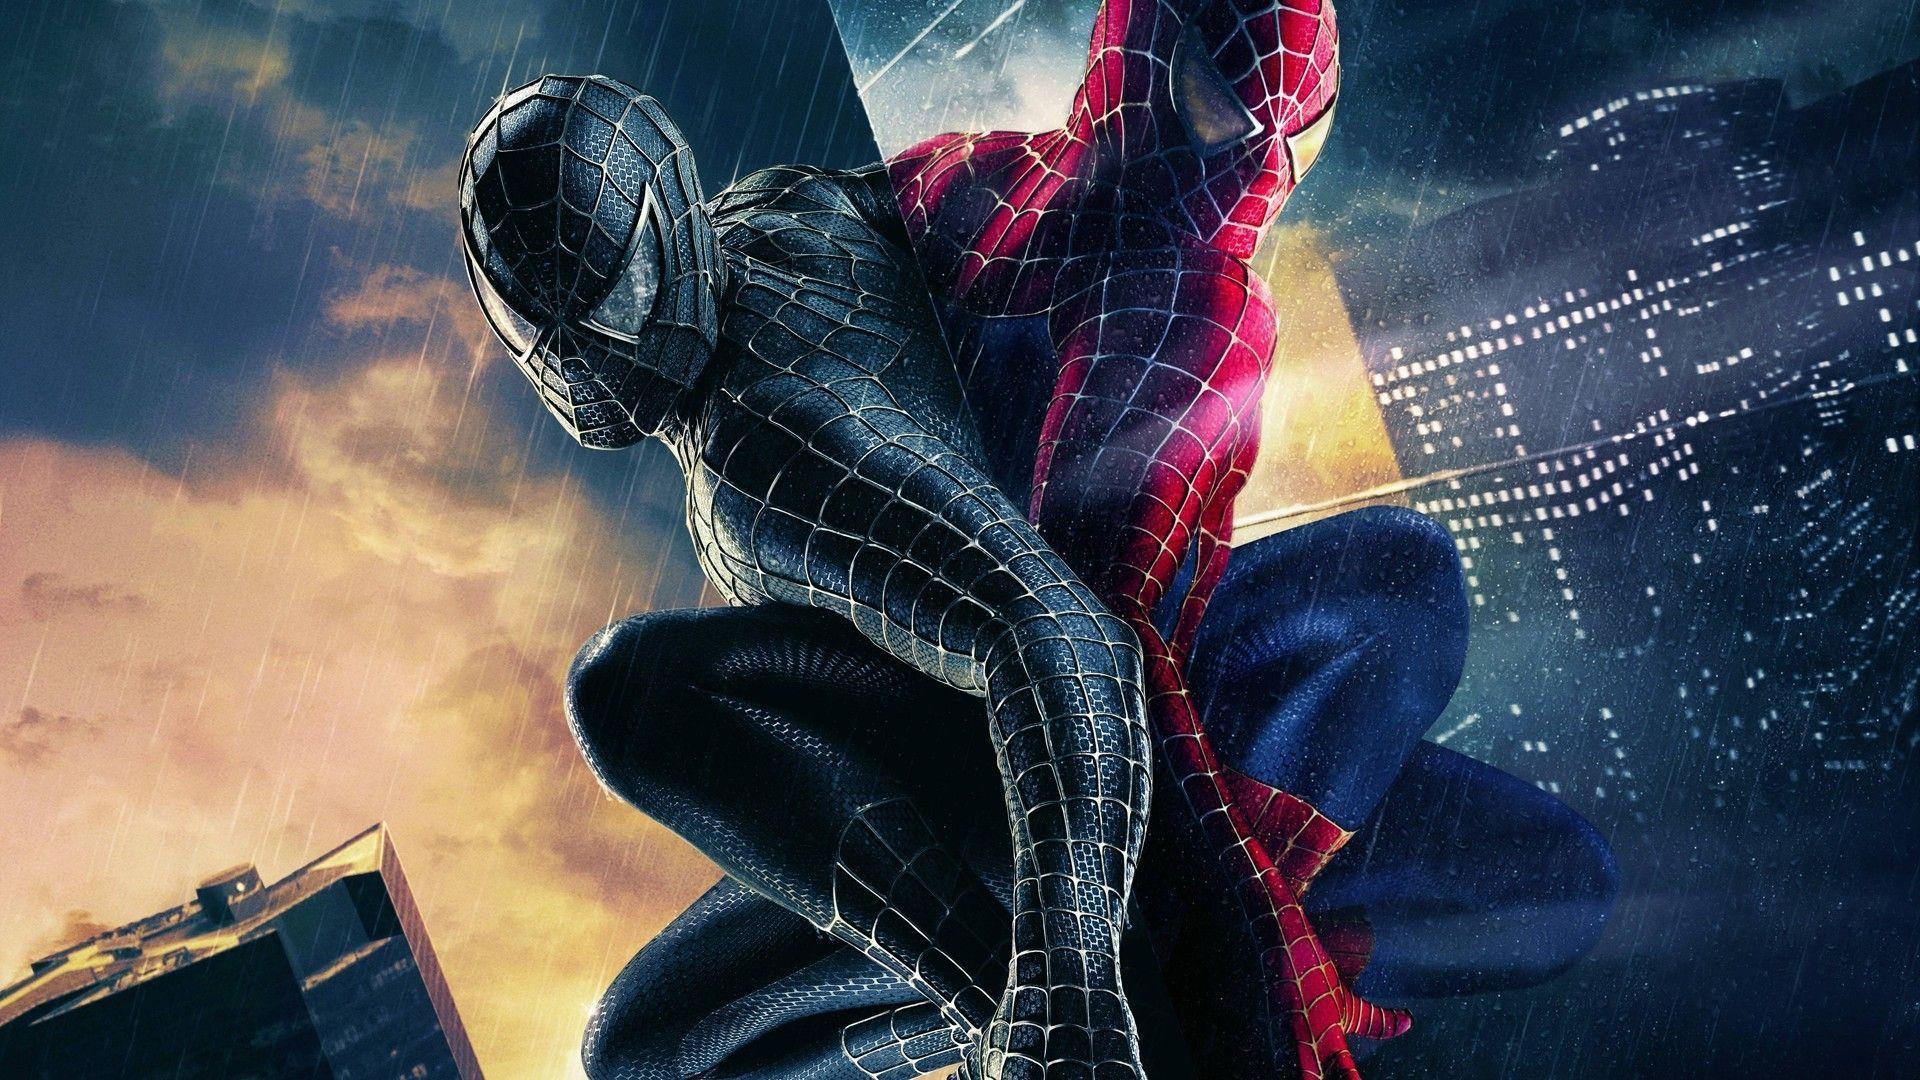 The Amazing SpiderMan HD Desktop Wallpaper Widescreen High 1920x1080 Spiderman Picture Wallpapers